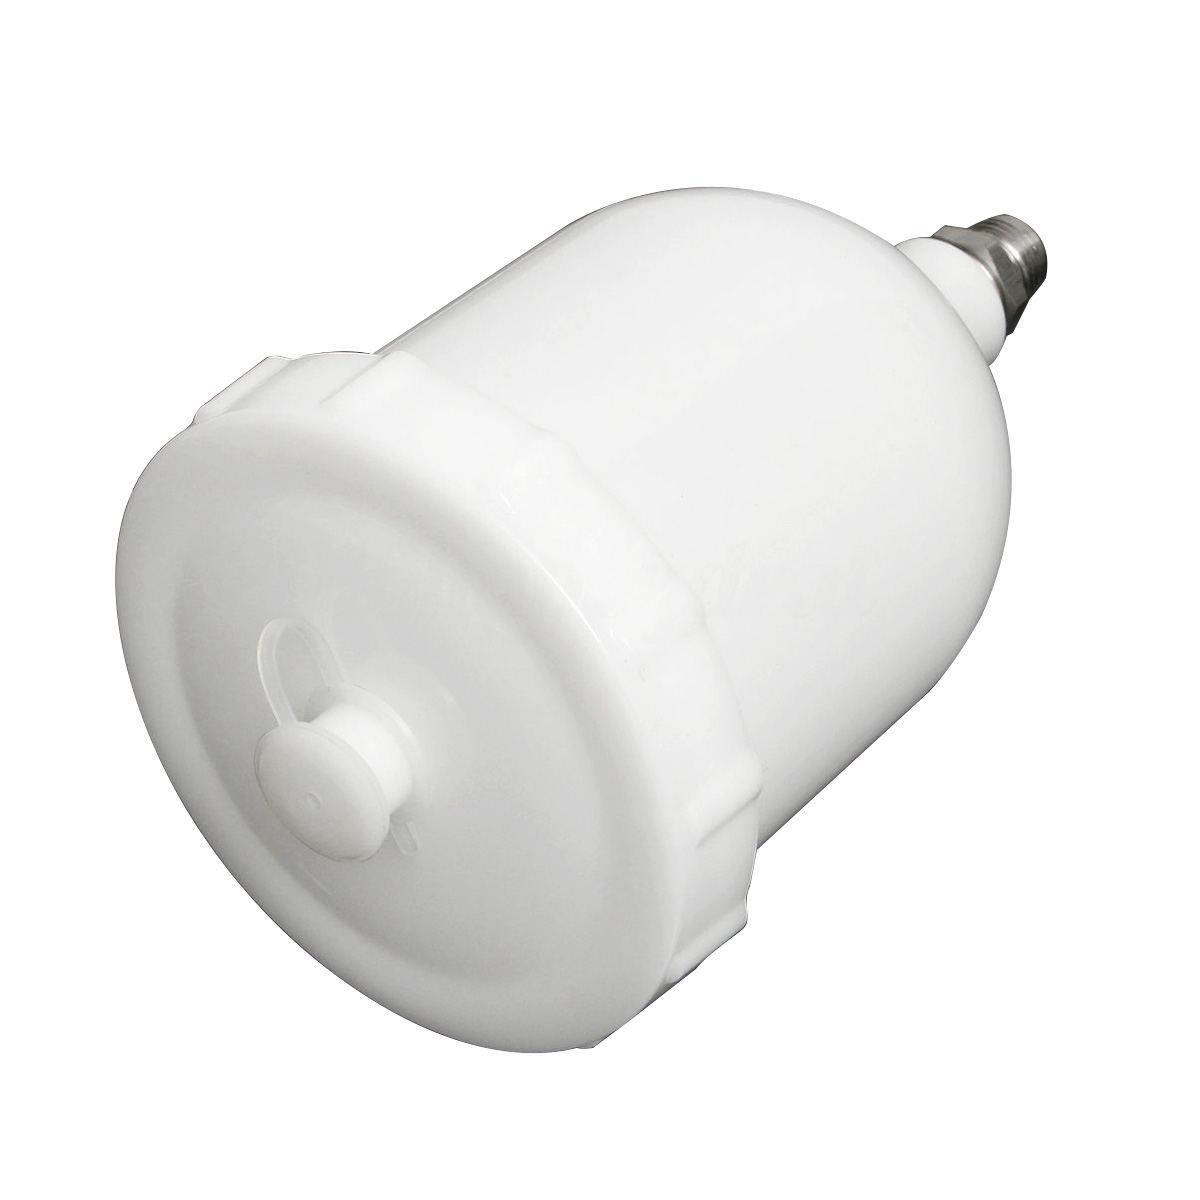 TOOGOO(R) Spray Gun Cup Replacement Pot 600ML For Devilbiss GTI / TEKNA Pro Pri FLG New